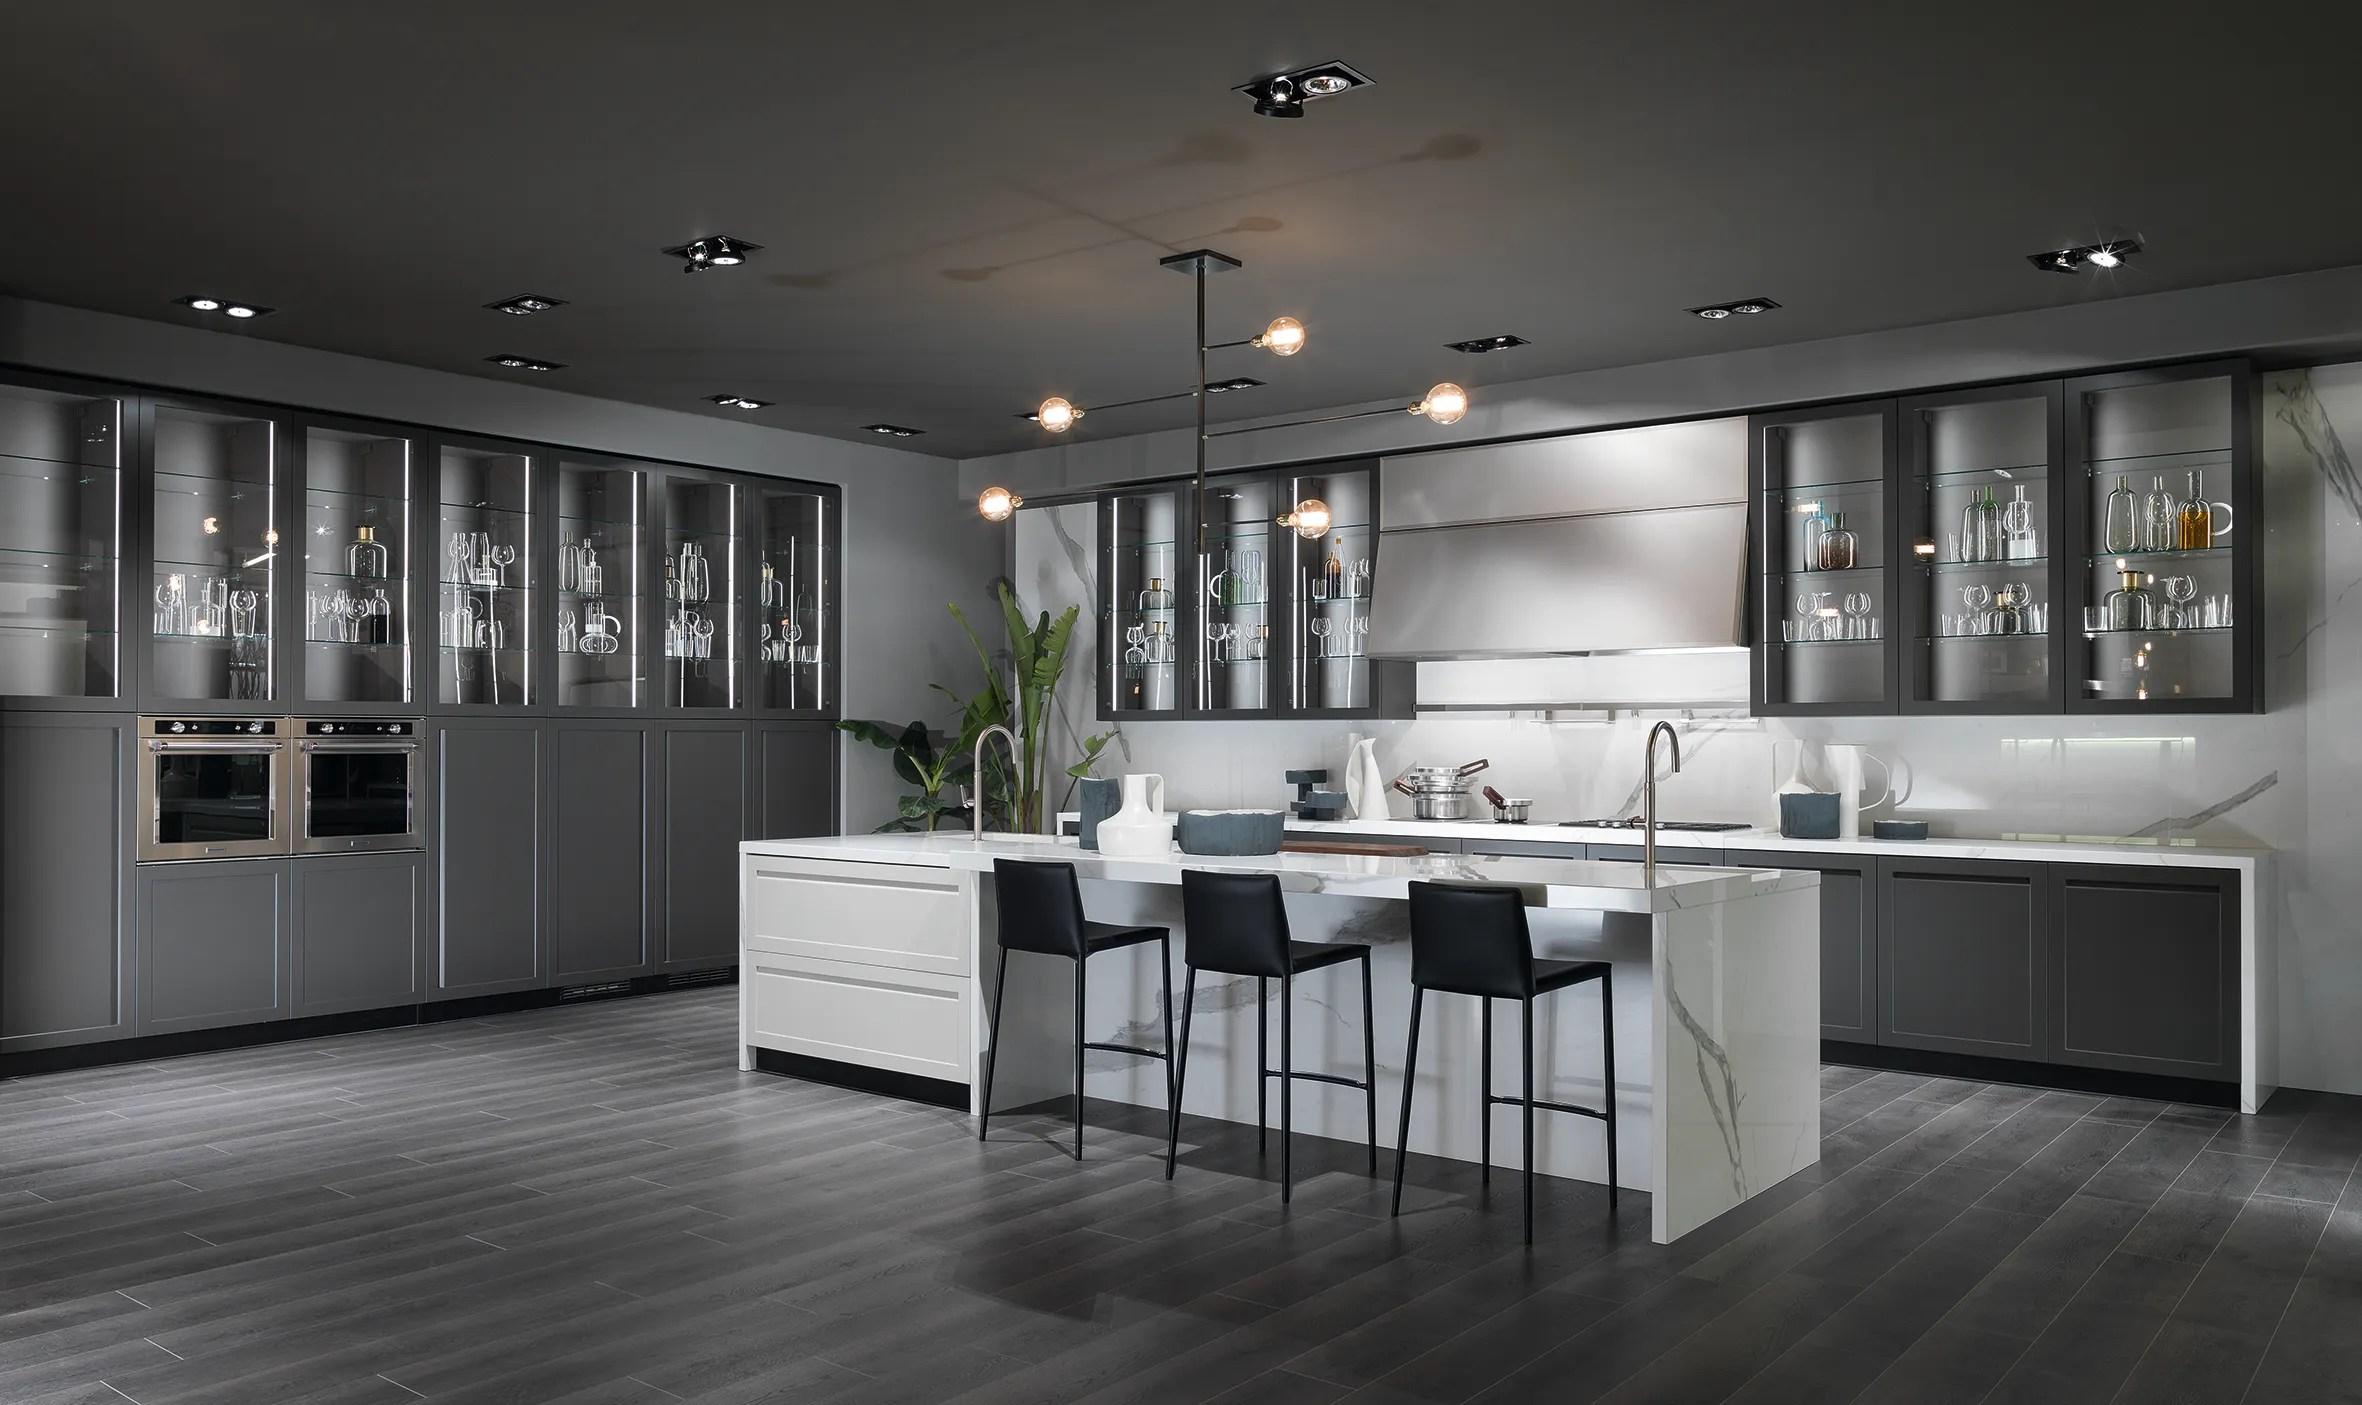 Kitchen Design Ideas  Trends from Salone del Mobile 2016